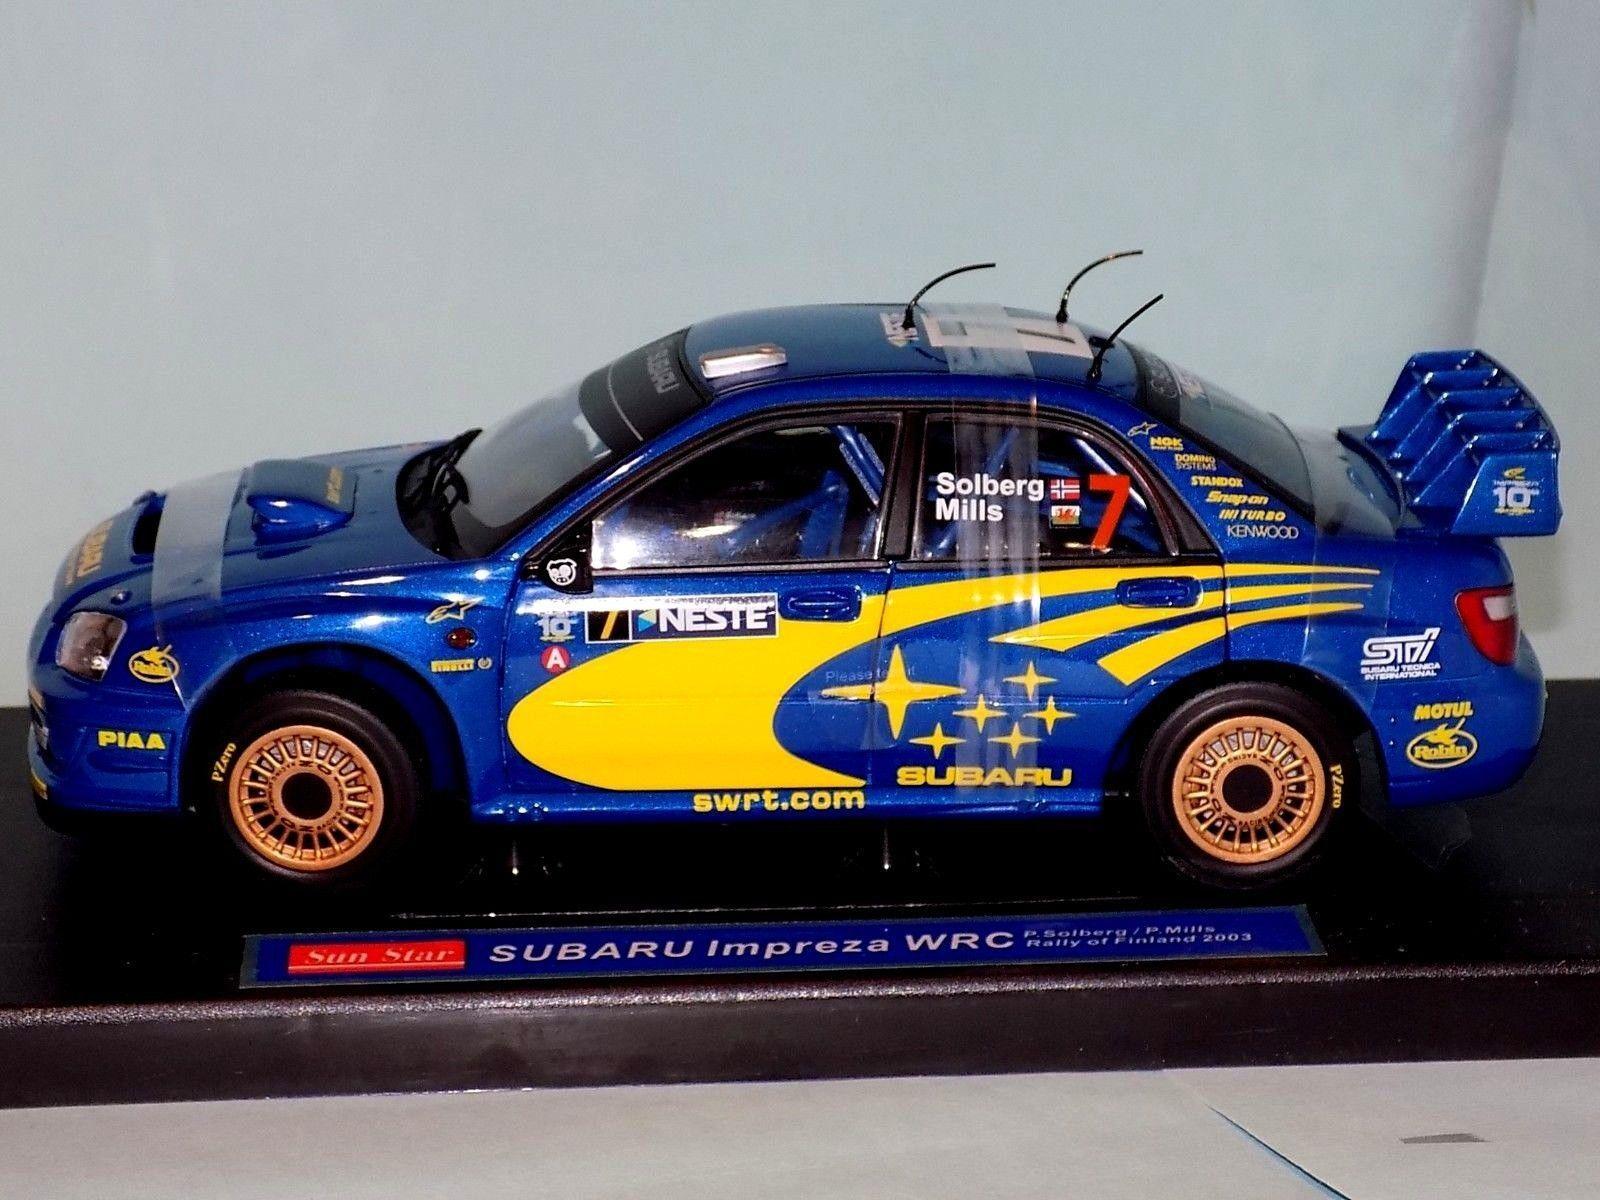 Subaru Impreza WRC Finland 2003 P.Solberg P.Mills 4362 SUN STAR 1 18